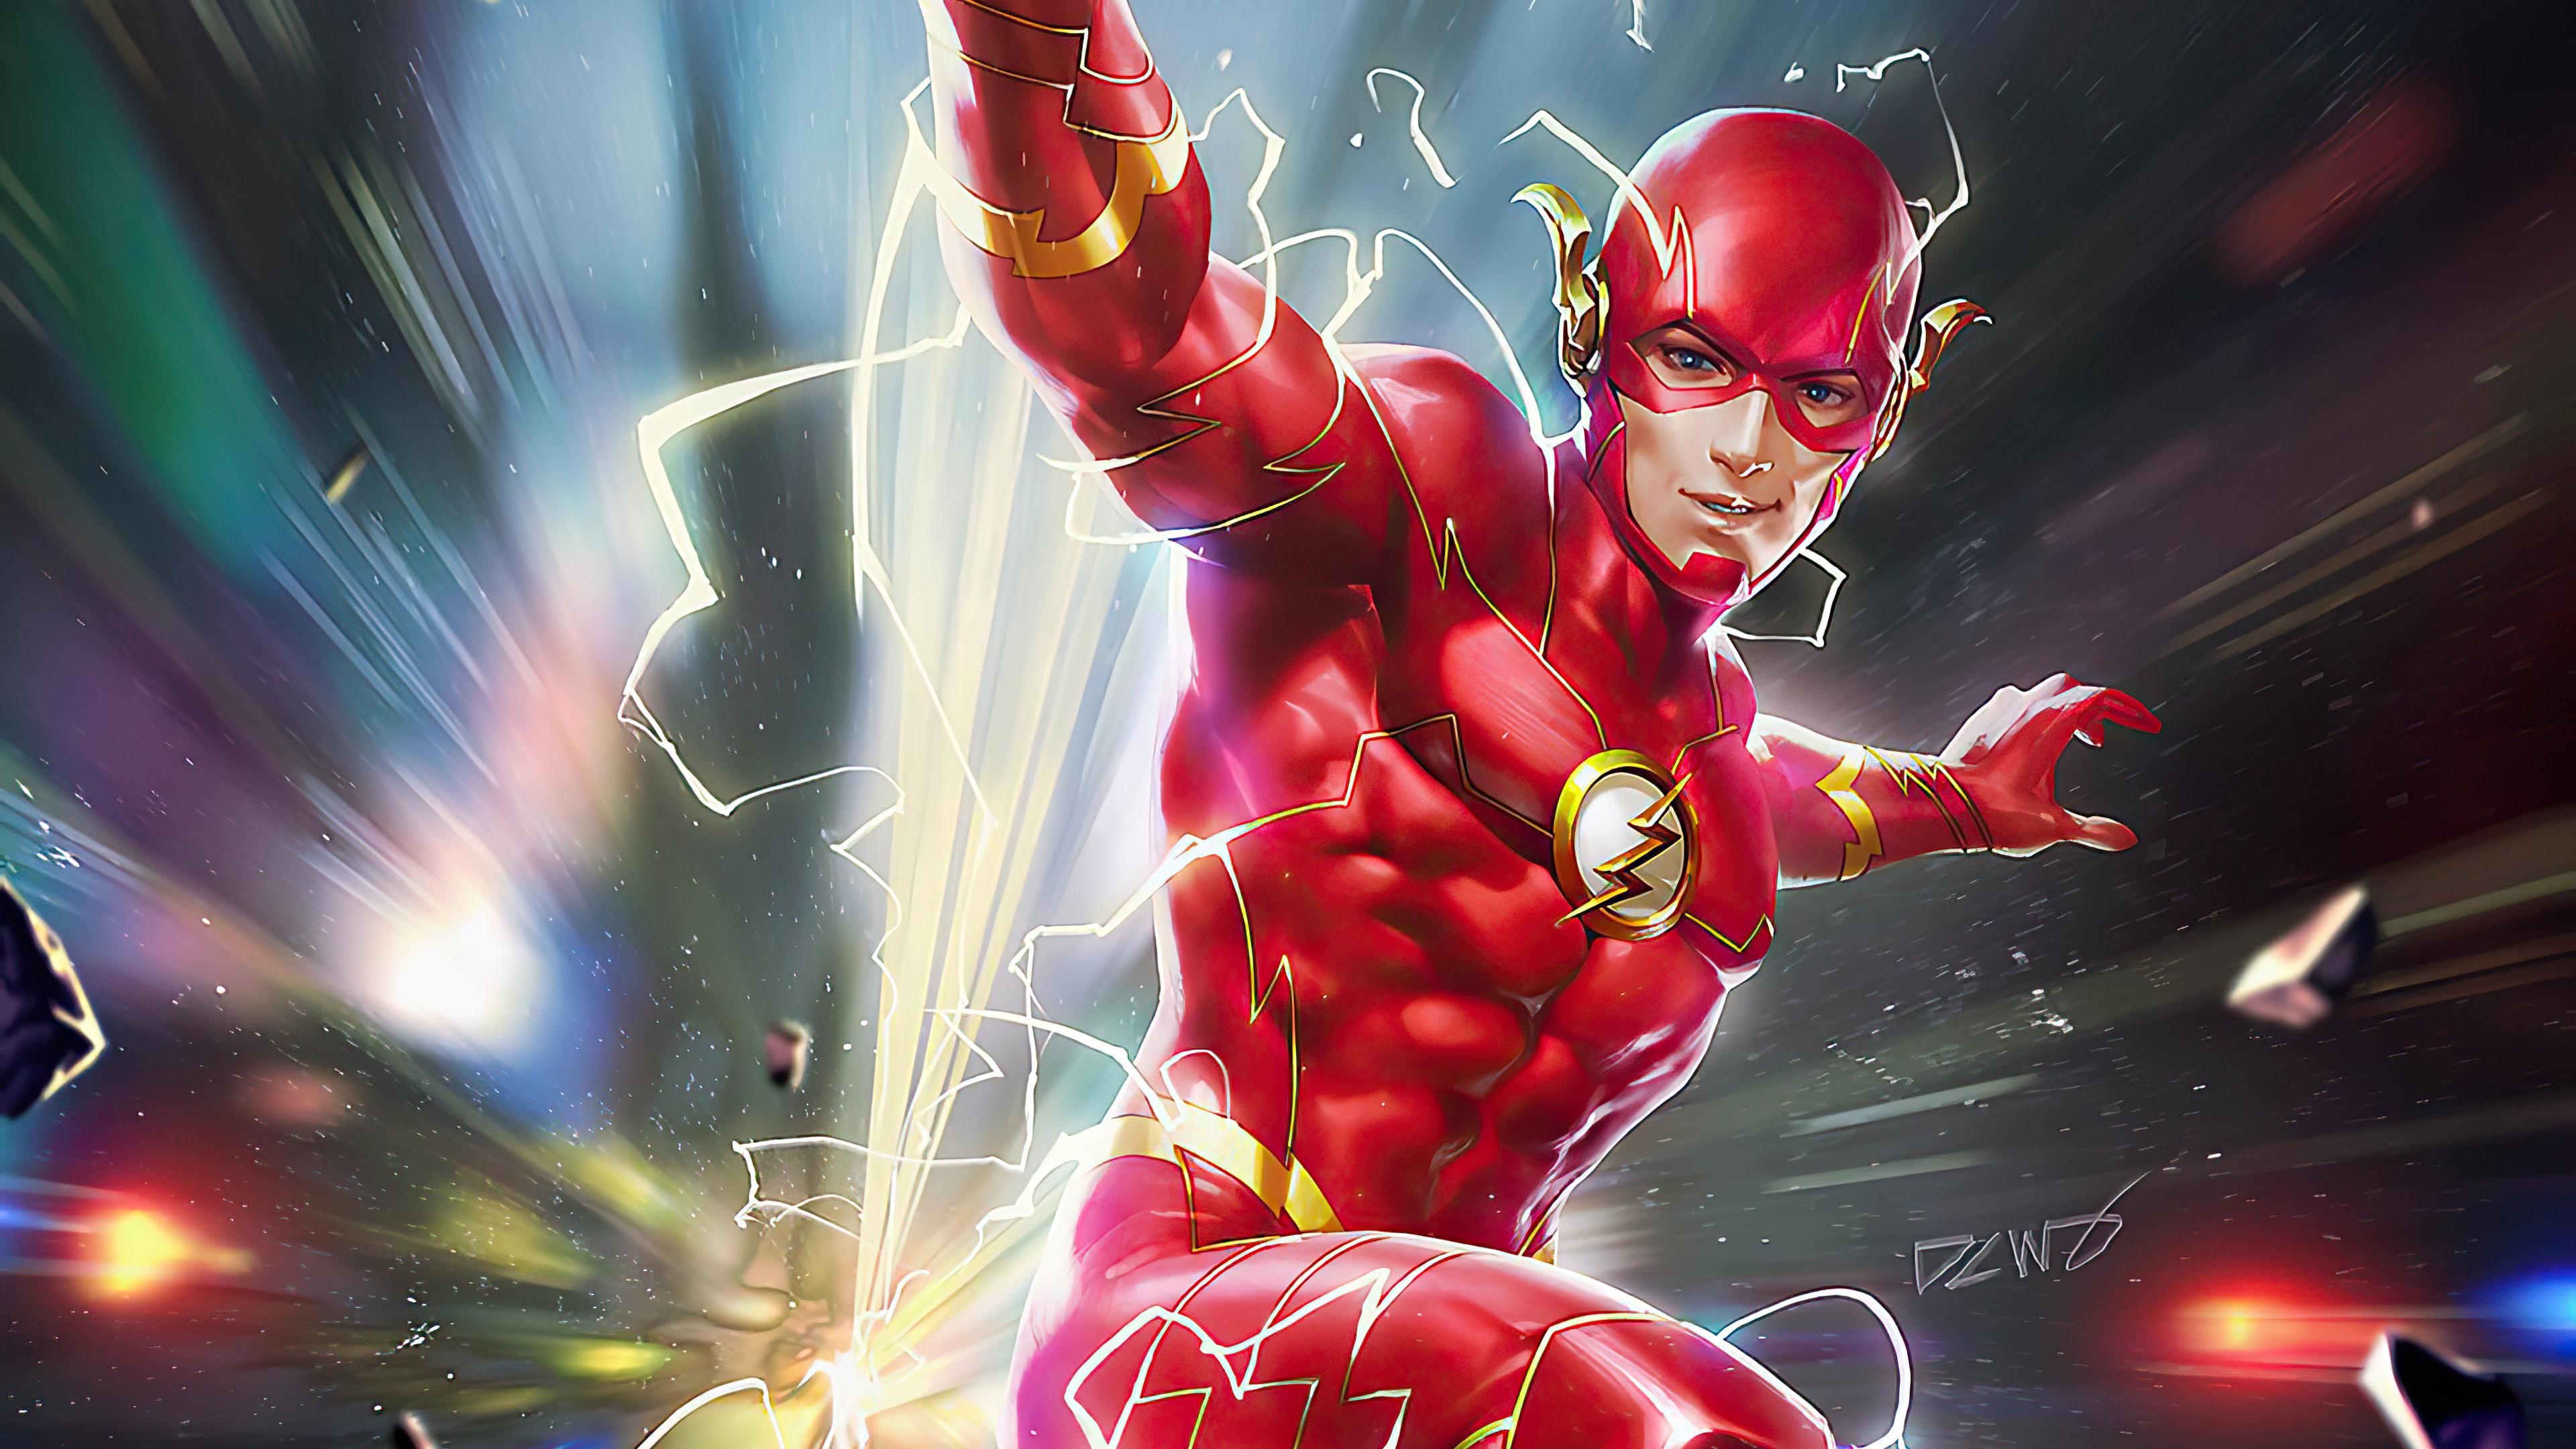 3840x2160 Flash Hero 4k HD 4k Wallpapers, Images ...